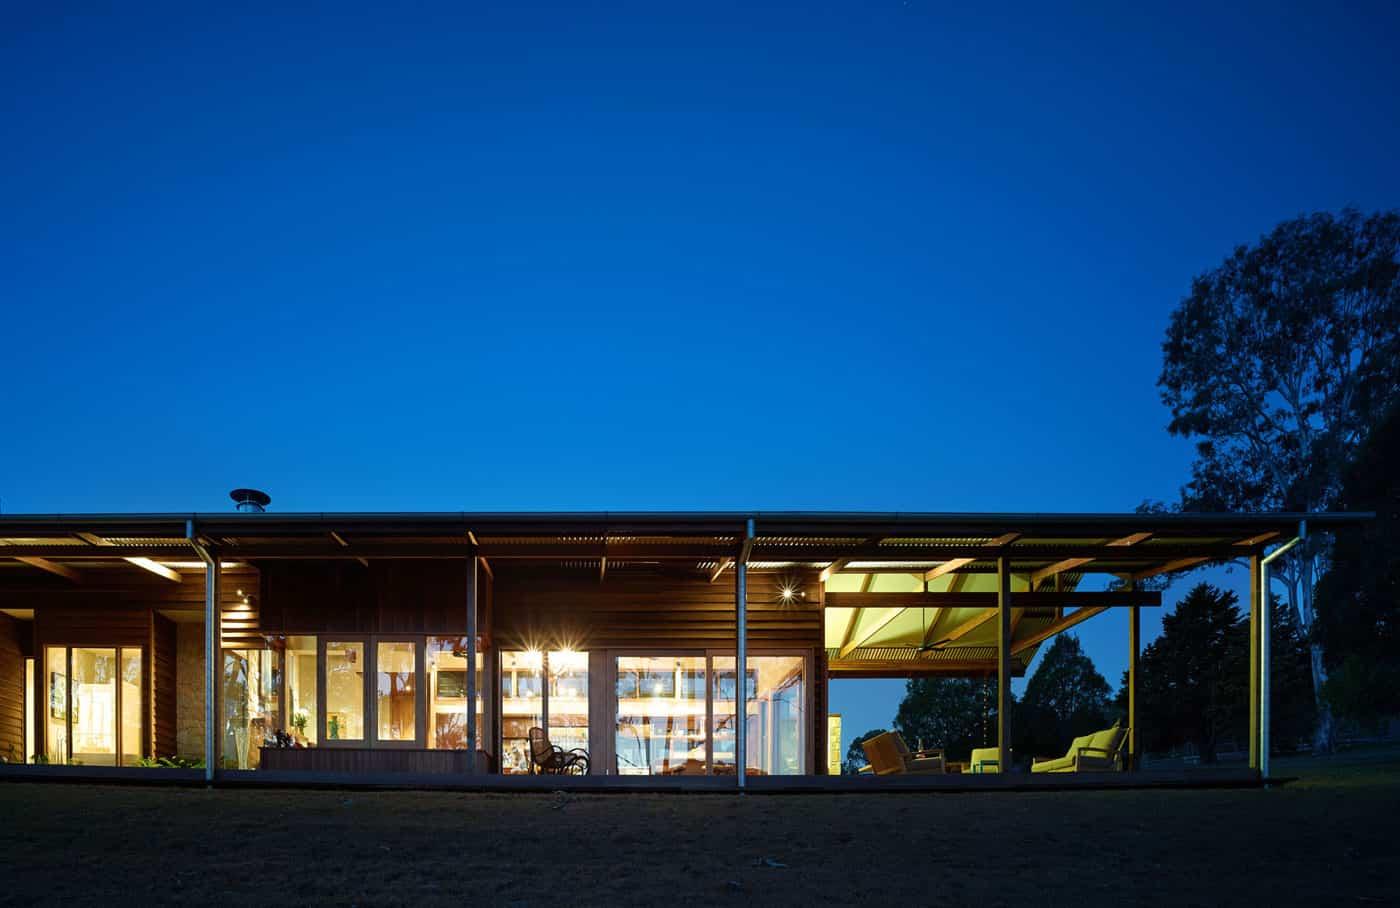 Hinterland House by Shaun Lockyer Architects